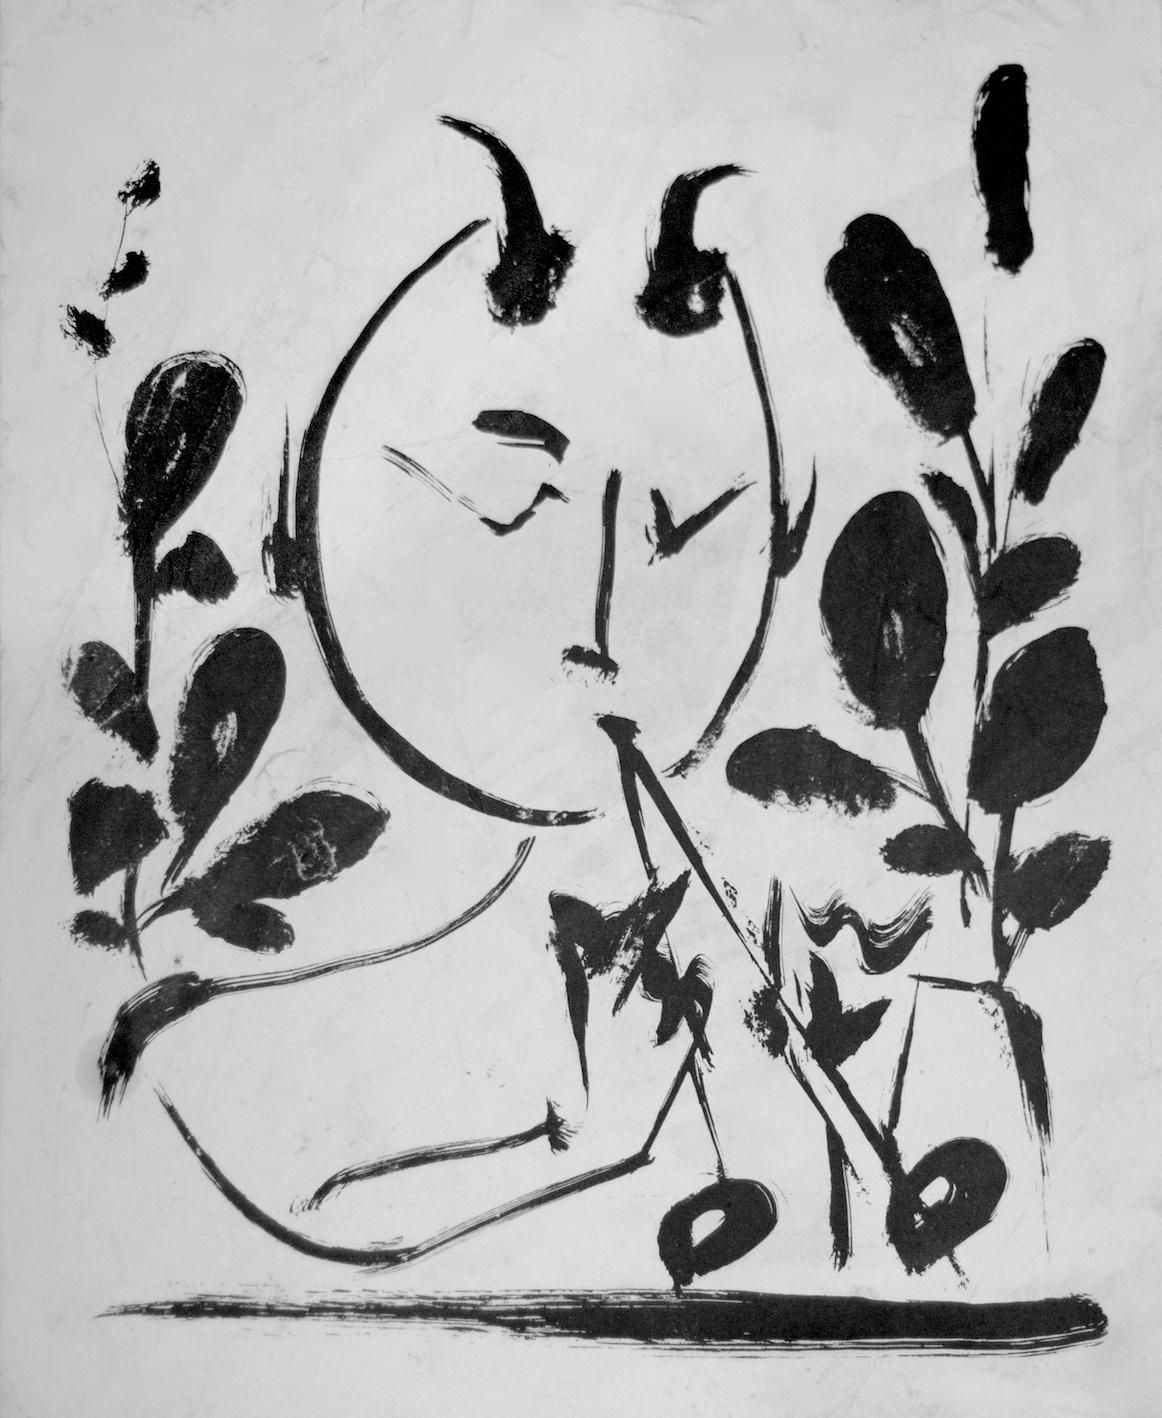 Pablo Picasso - Faun - Lithograph on paper - 1948